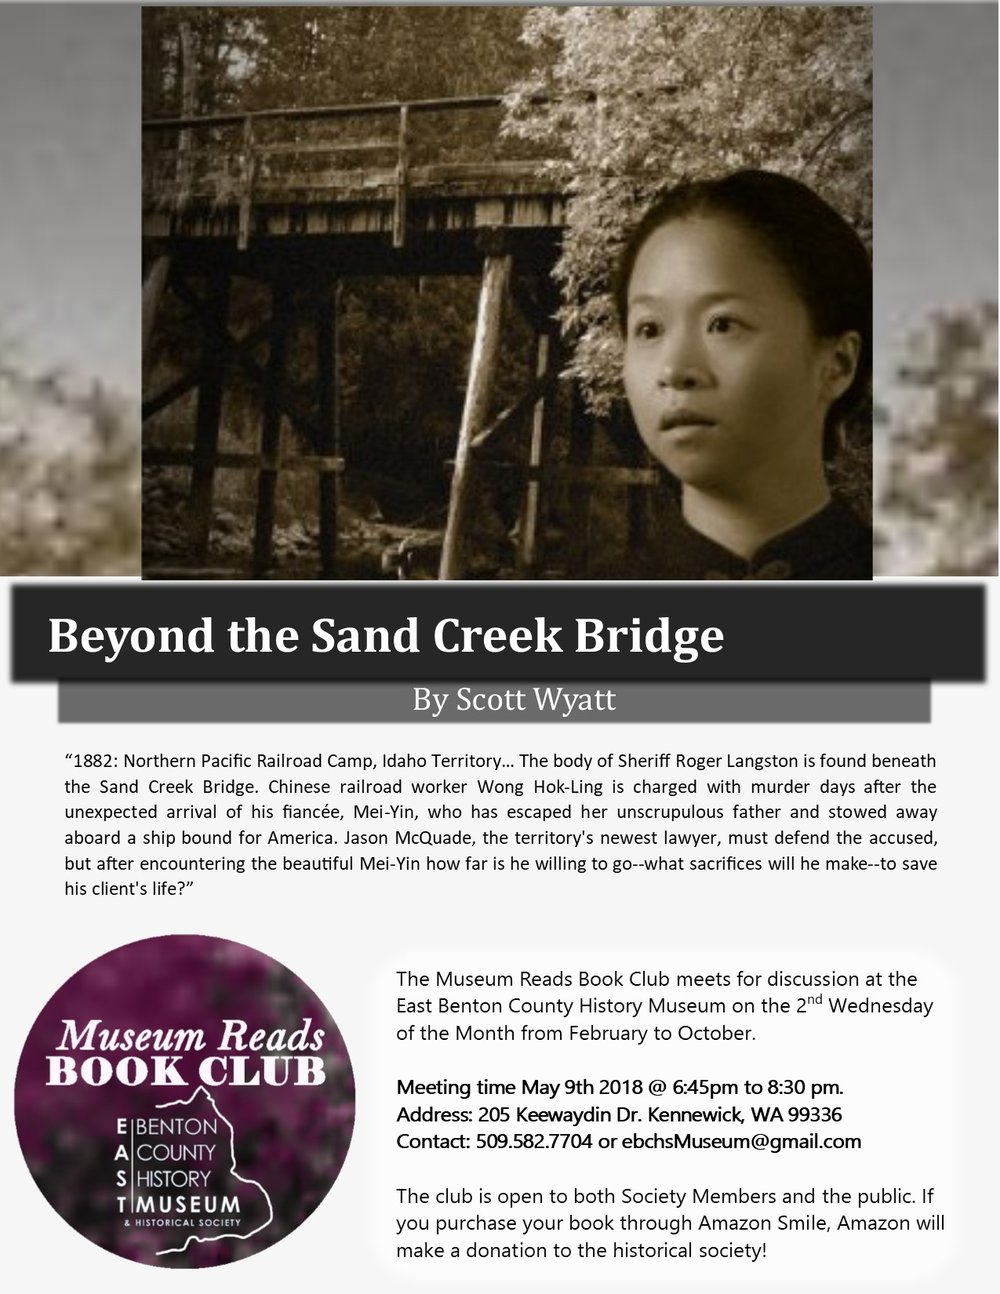 beyond sand creek bridge poster.jpg